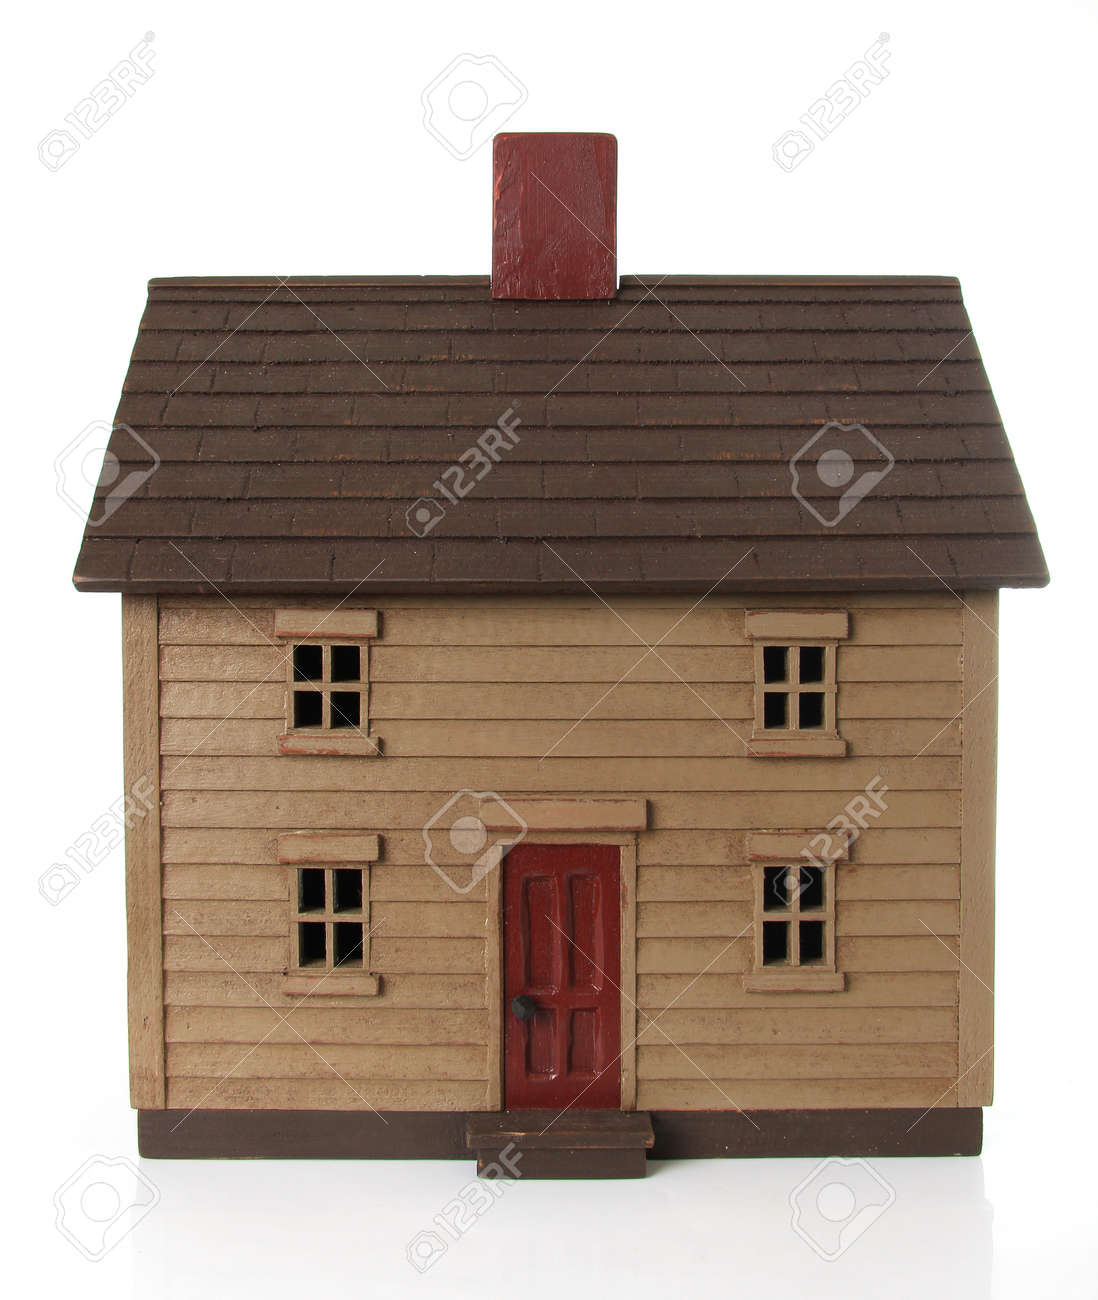 Shaker Style House Model Stock Photo   15422513